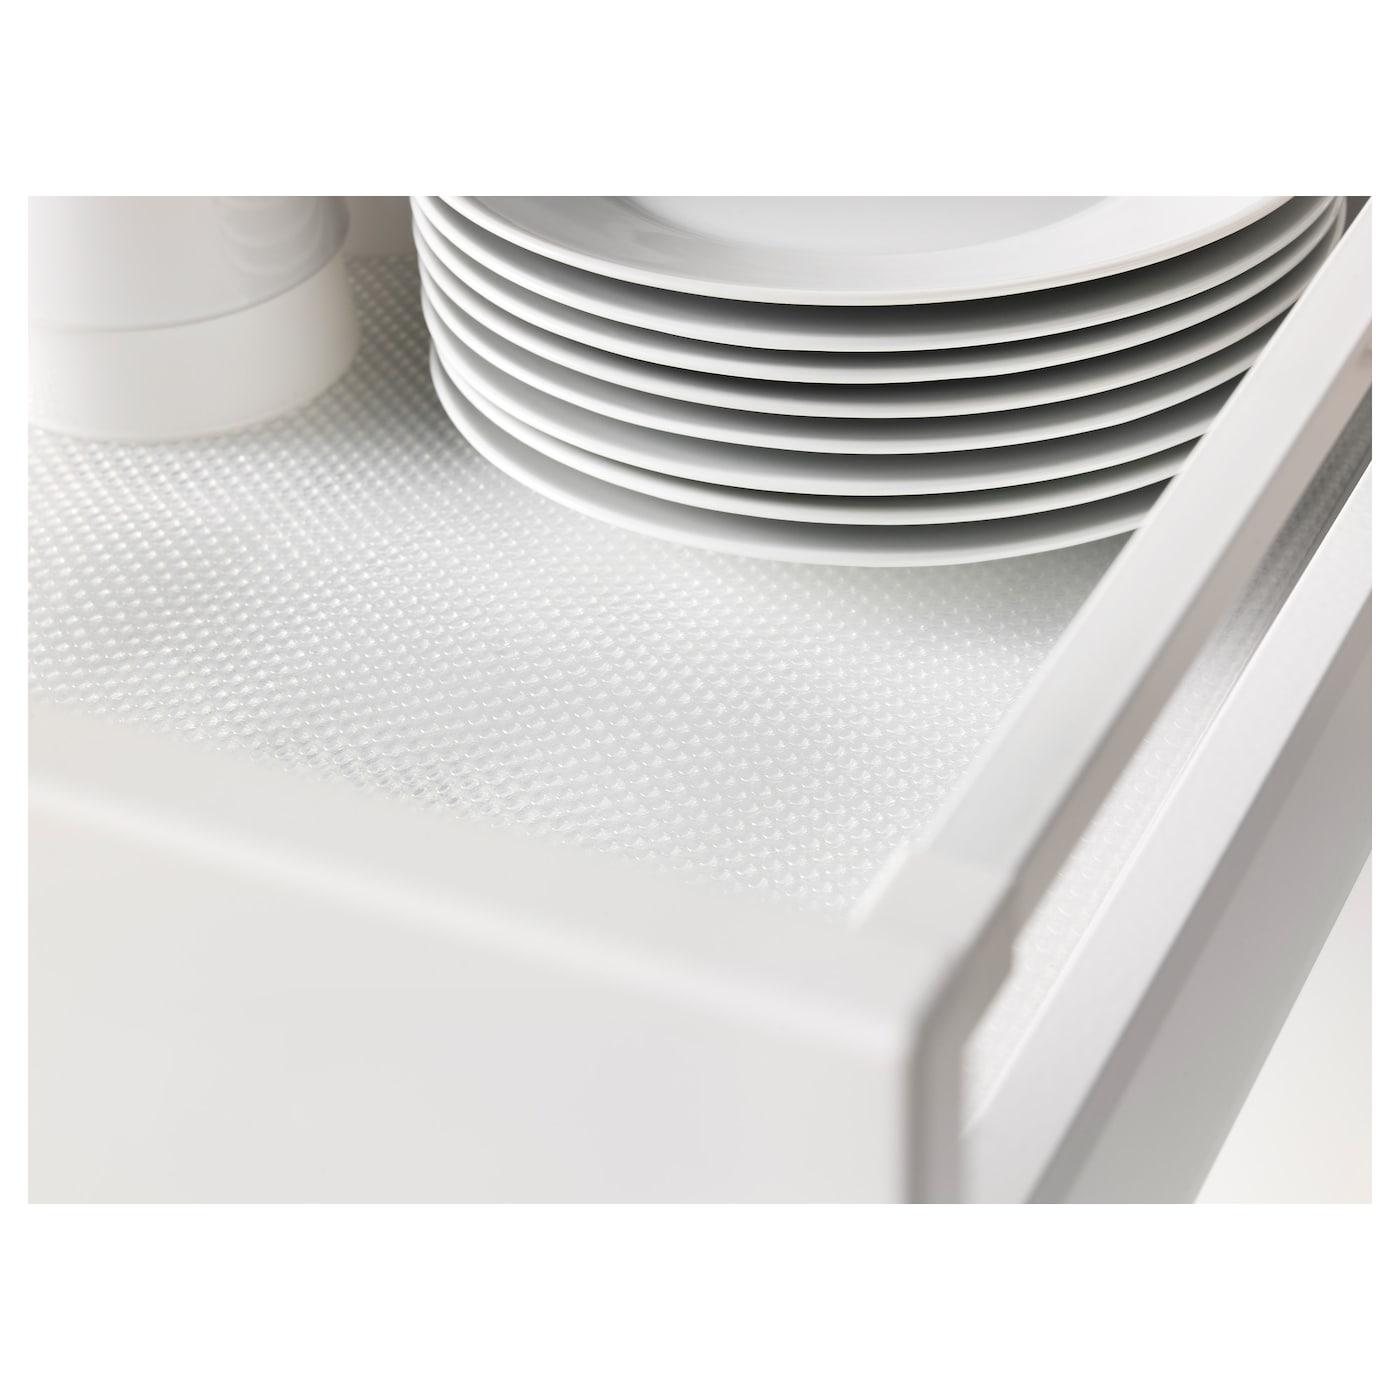 Variera Lademat Transparant Ikea